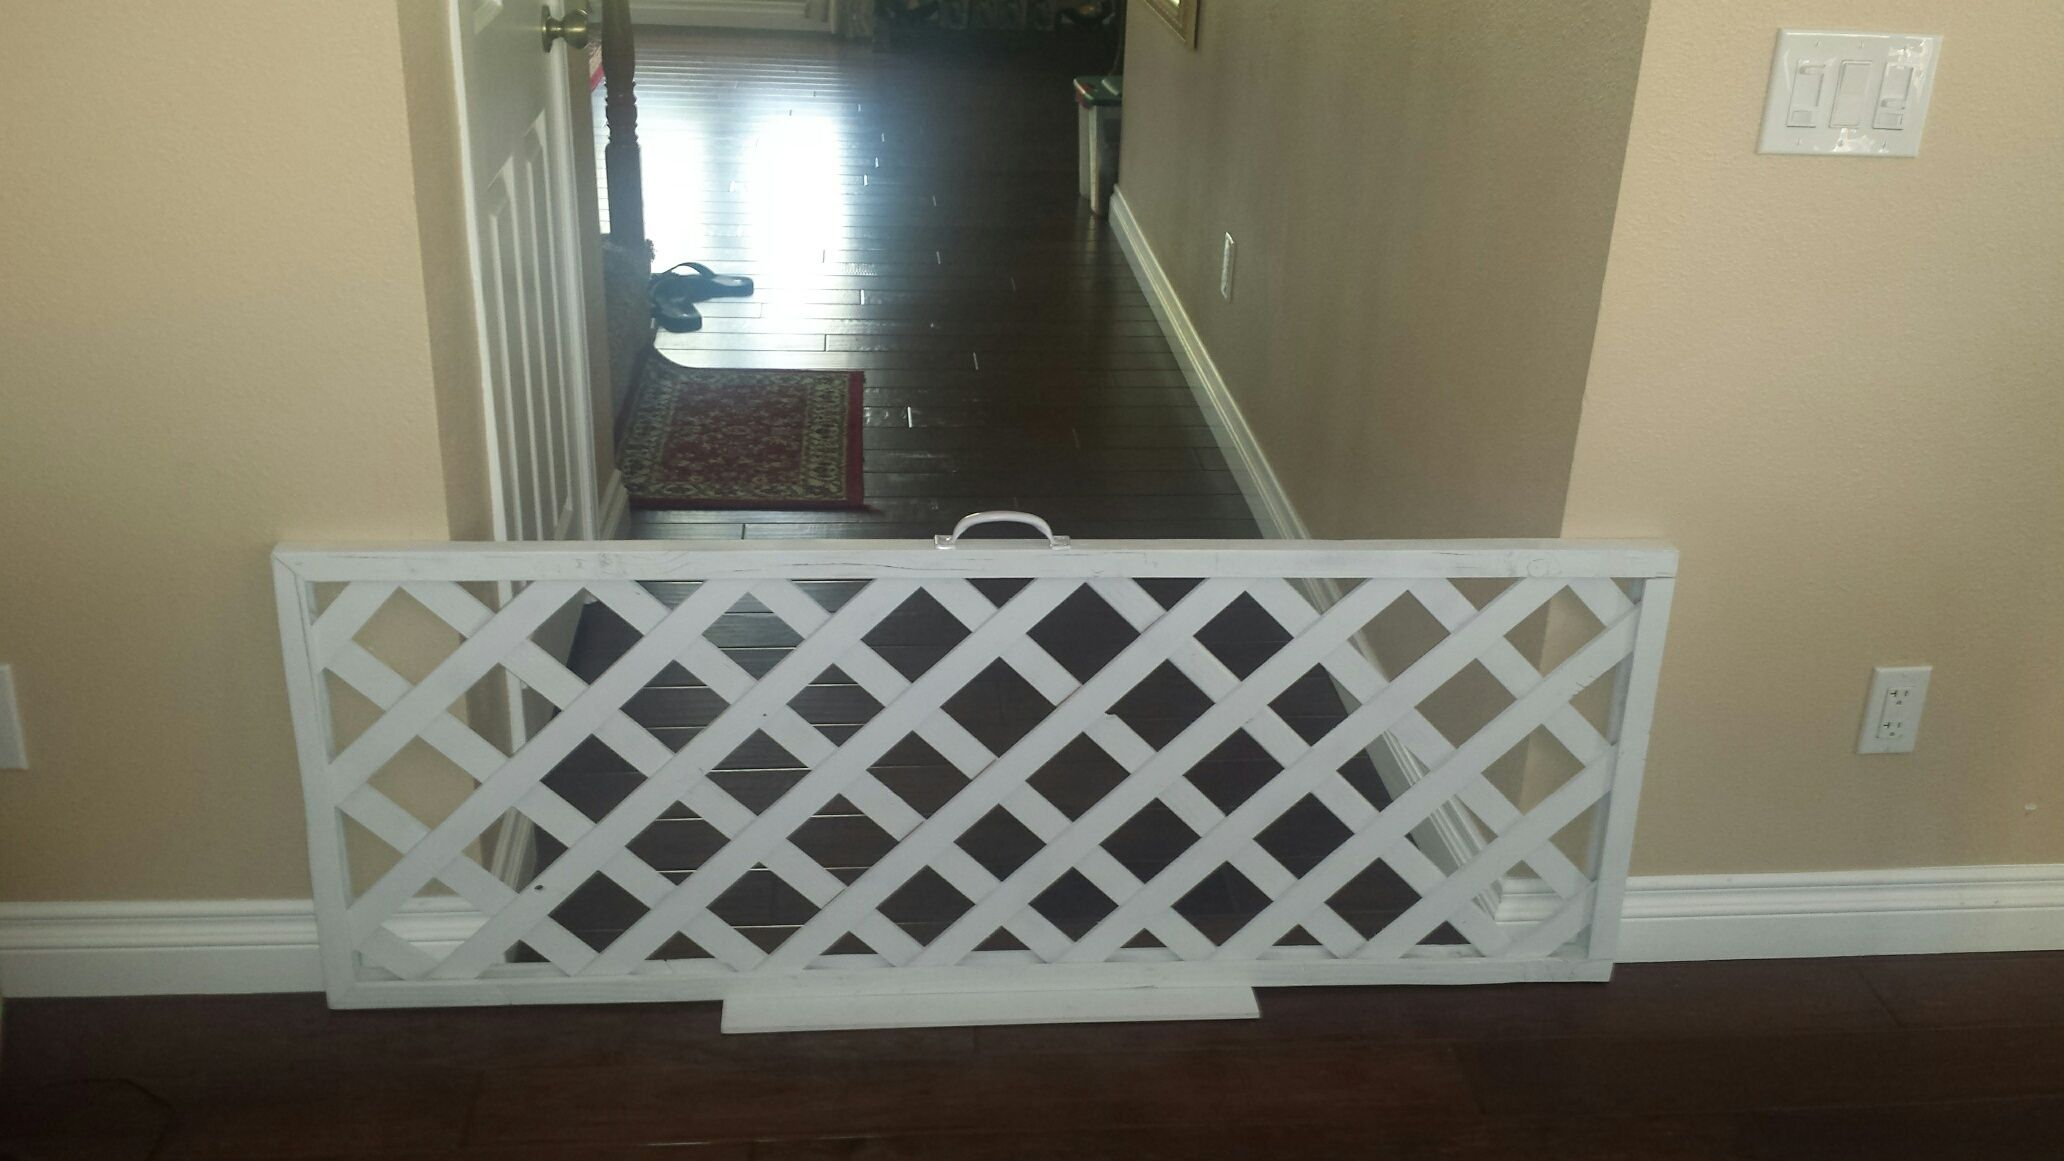 Inexpensive indoor dog barrier / fence for wider hallways under ...